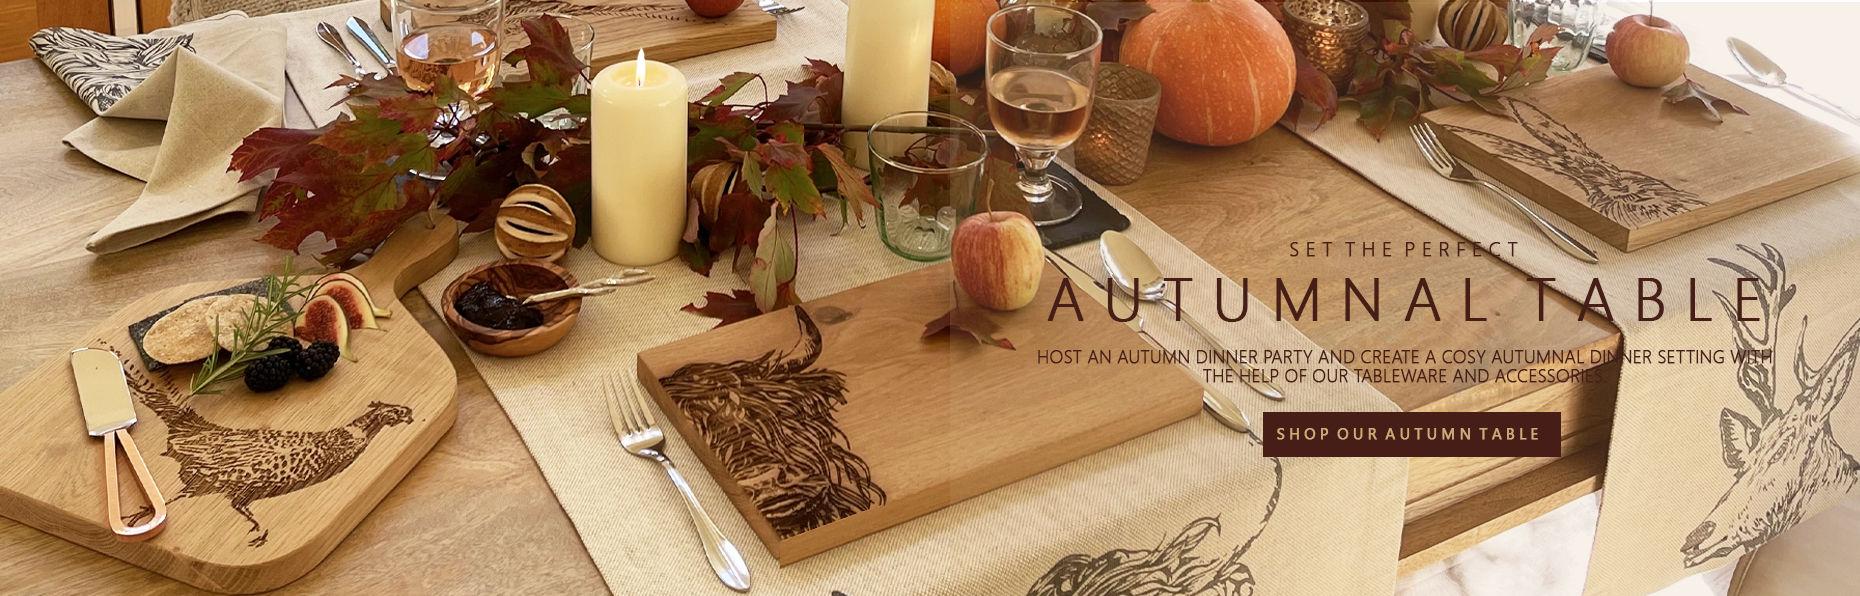 Create an Autumnal Table Setting